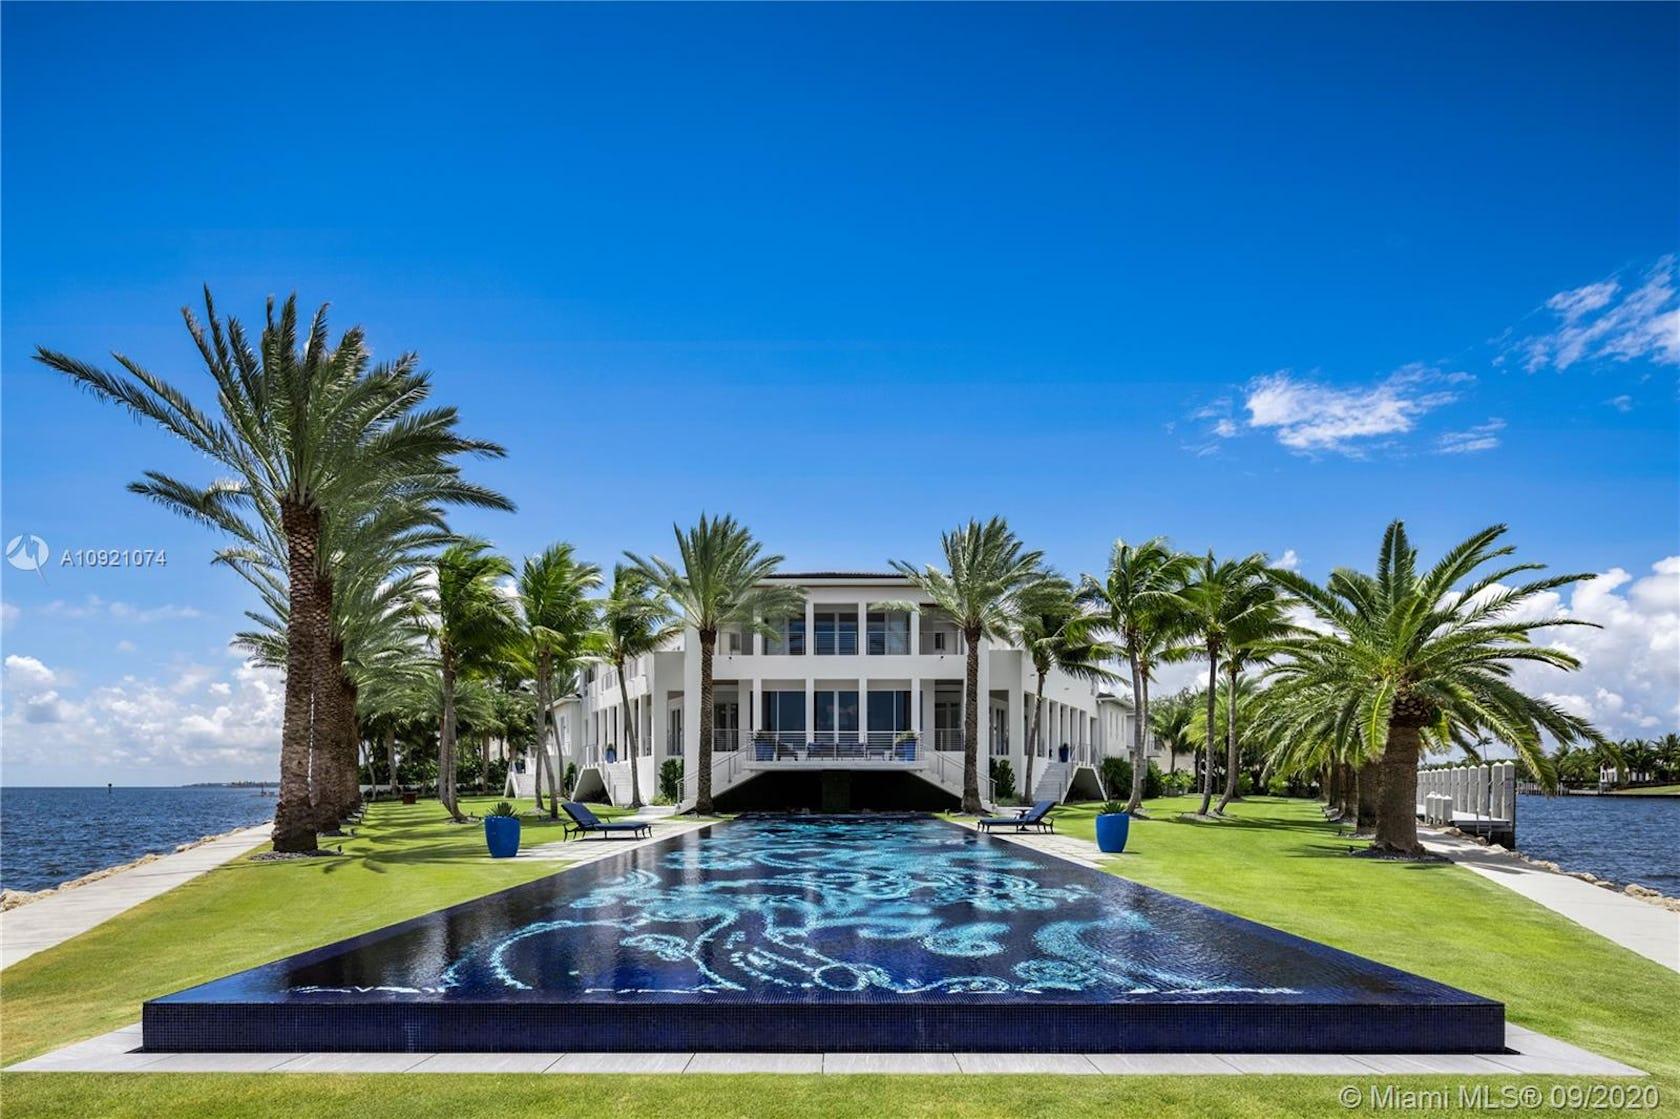 building hotel resort palm tree plant arecaceae tree